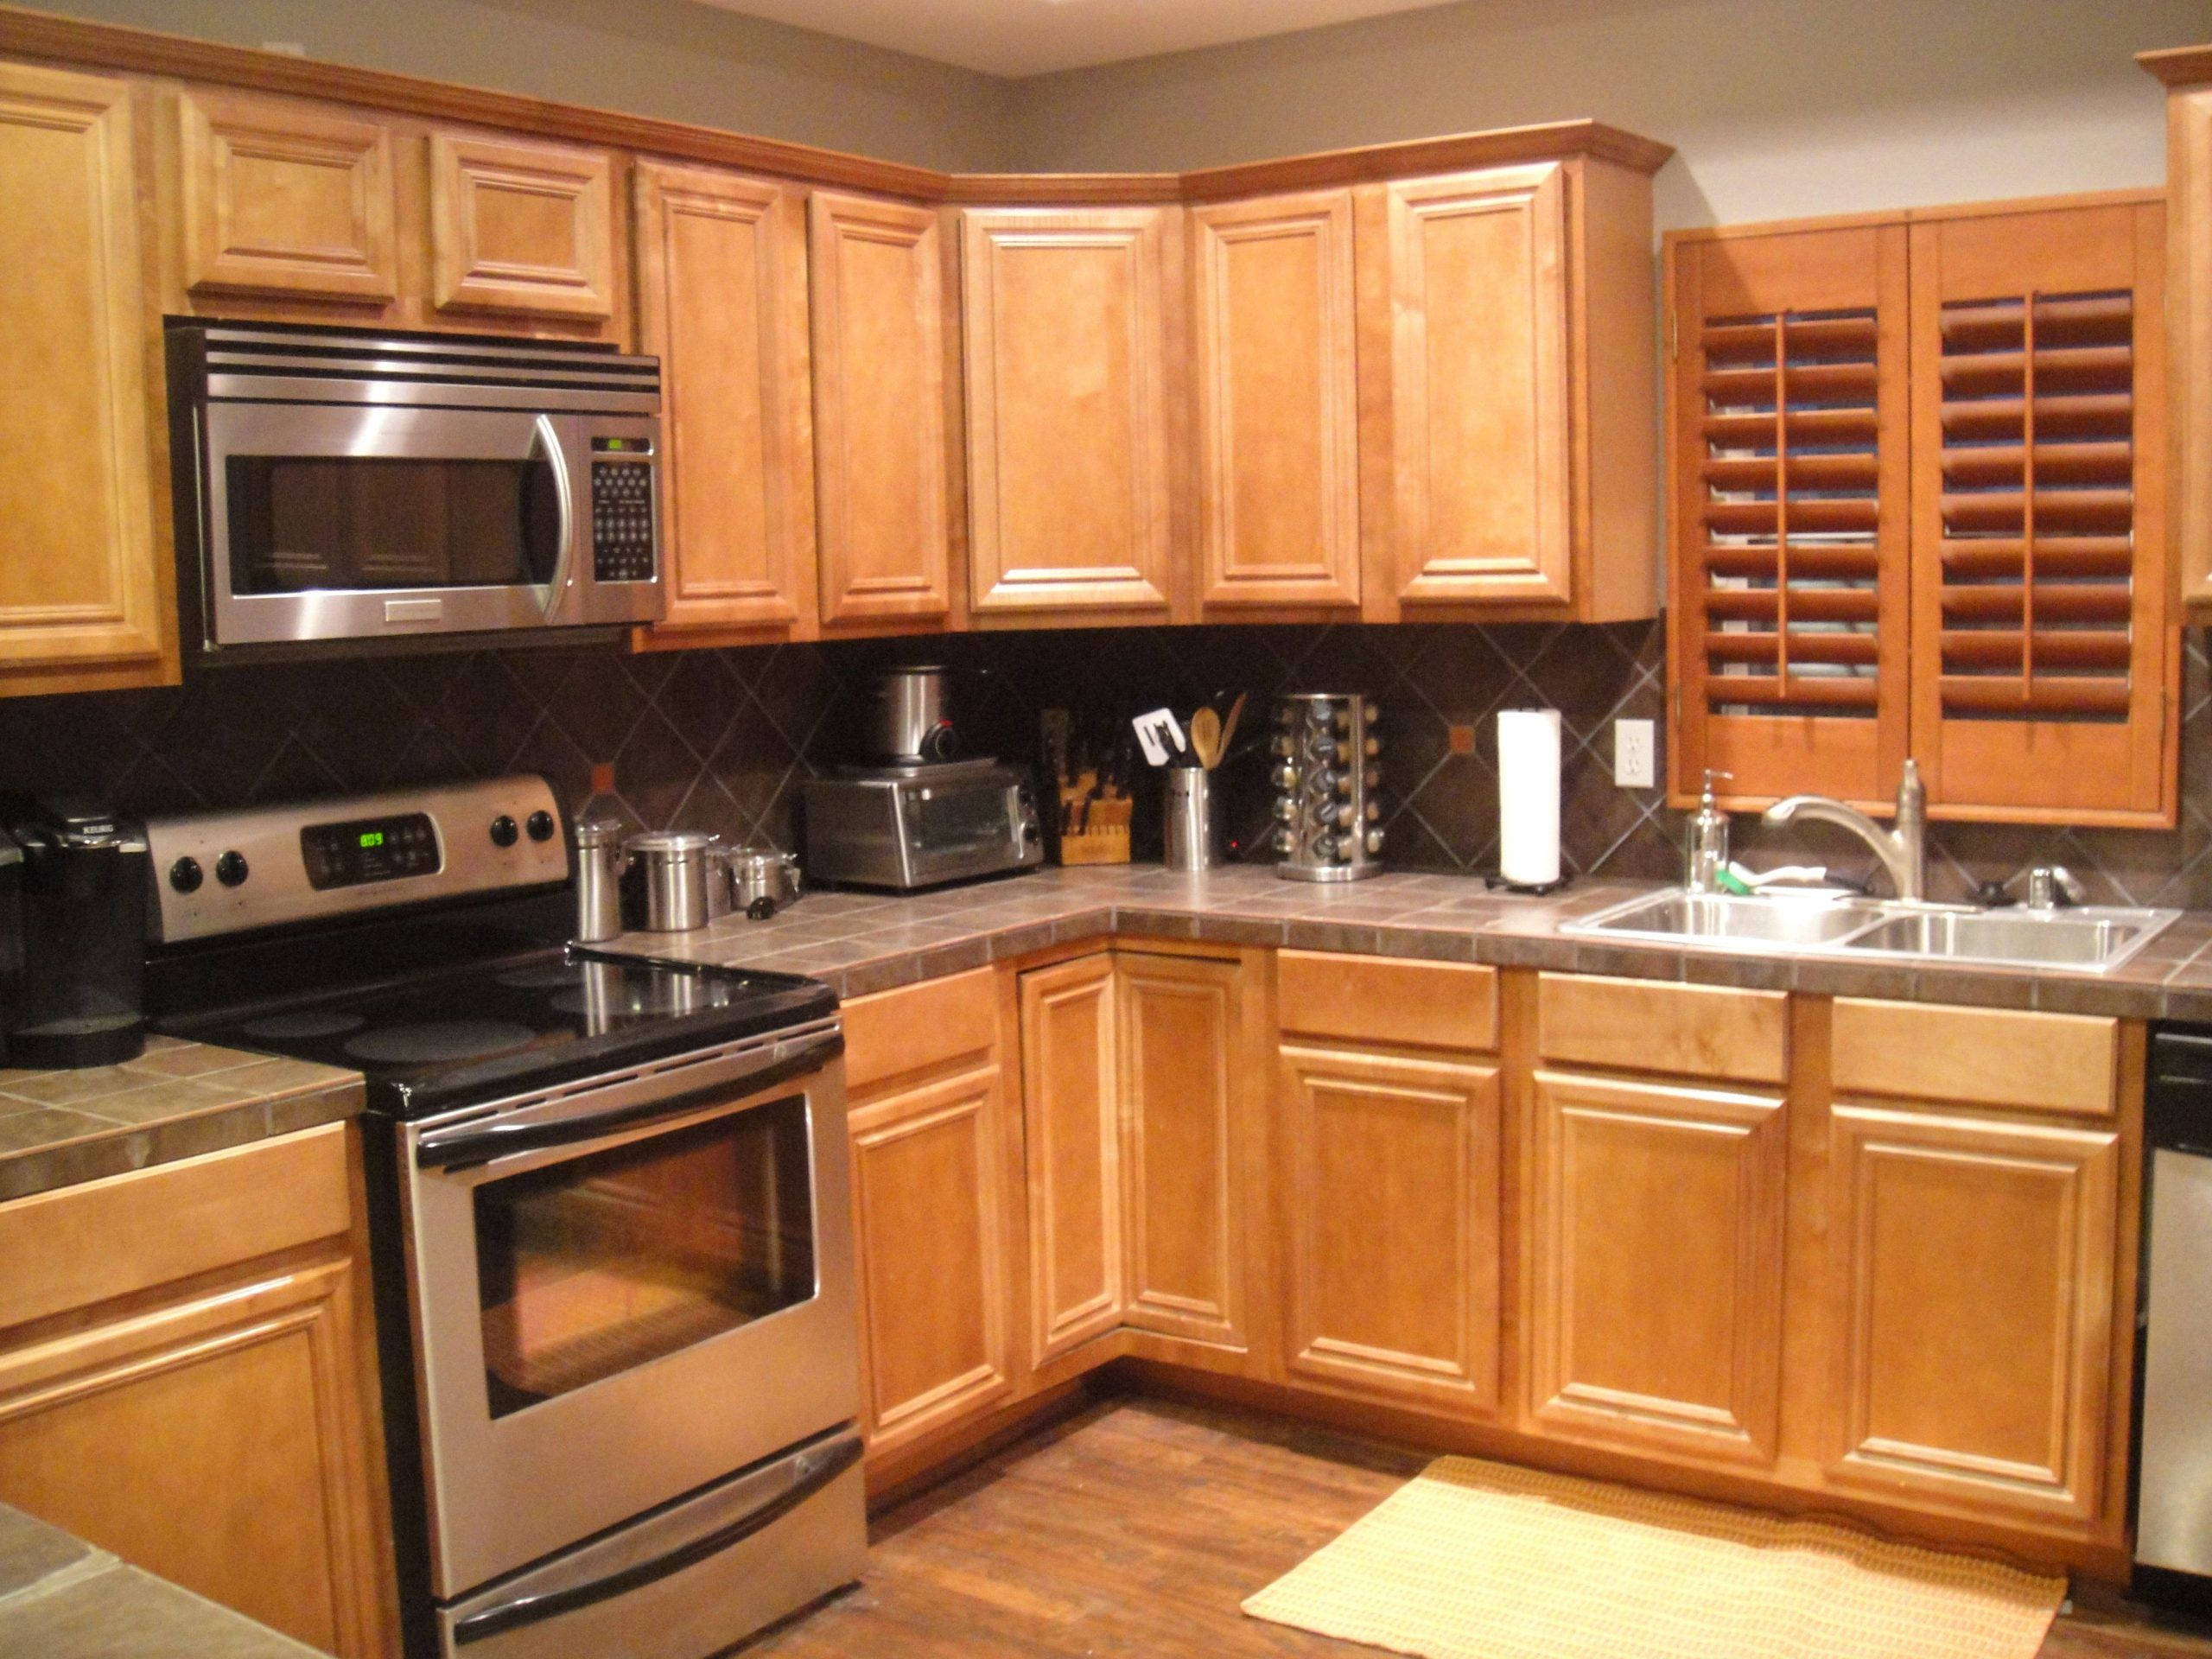 Dark Grey Cabinets With Light Grey Walls Artistic Color Decor Also Backsplash Ideas For Cherr In 2020 Brown Kitchen Cabinets Kitchen Decor Honey Oak Cabinets